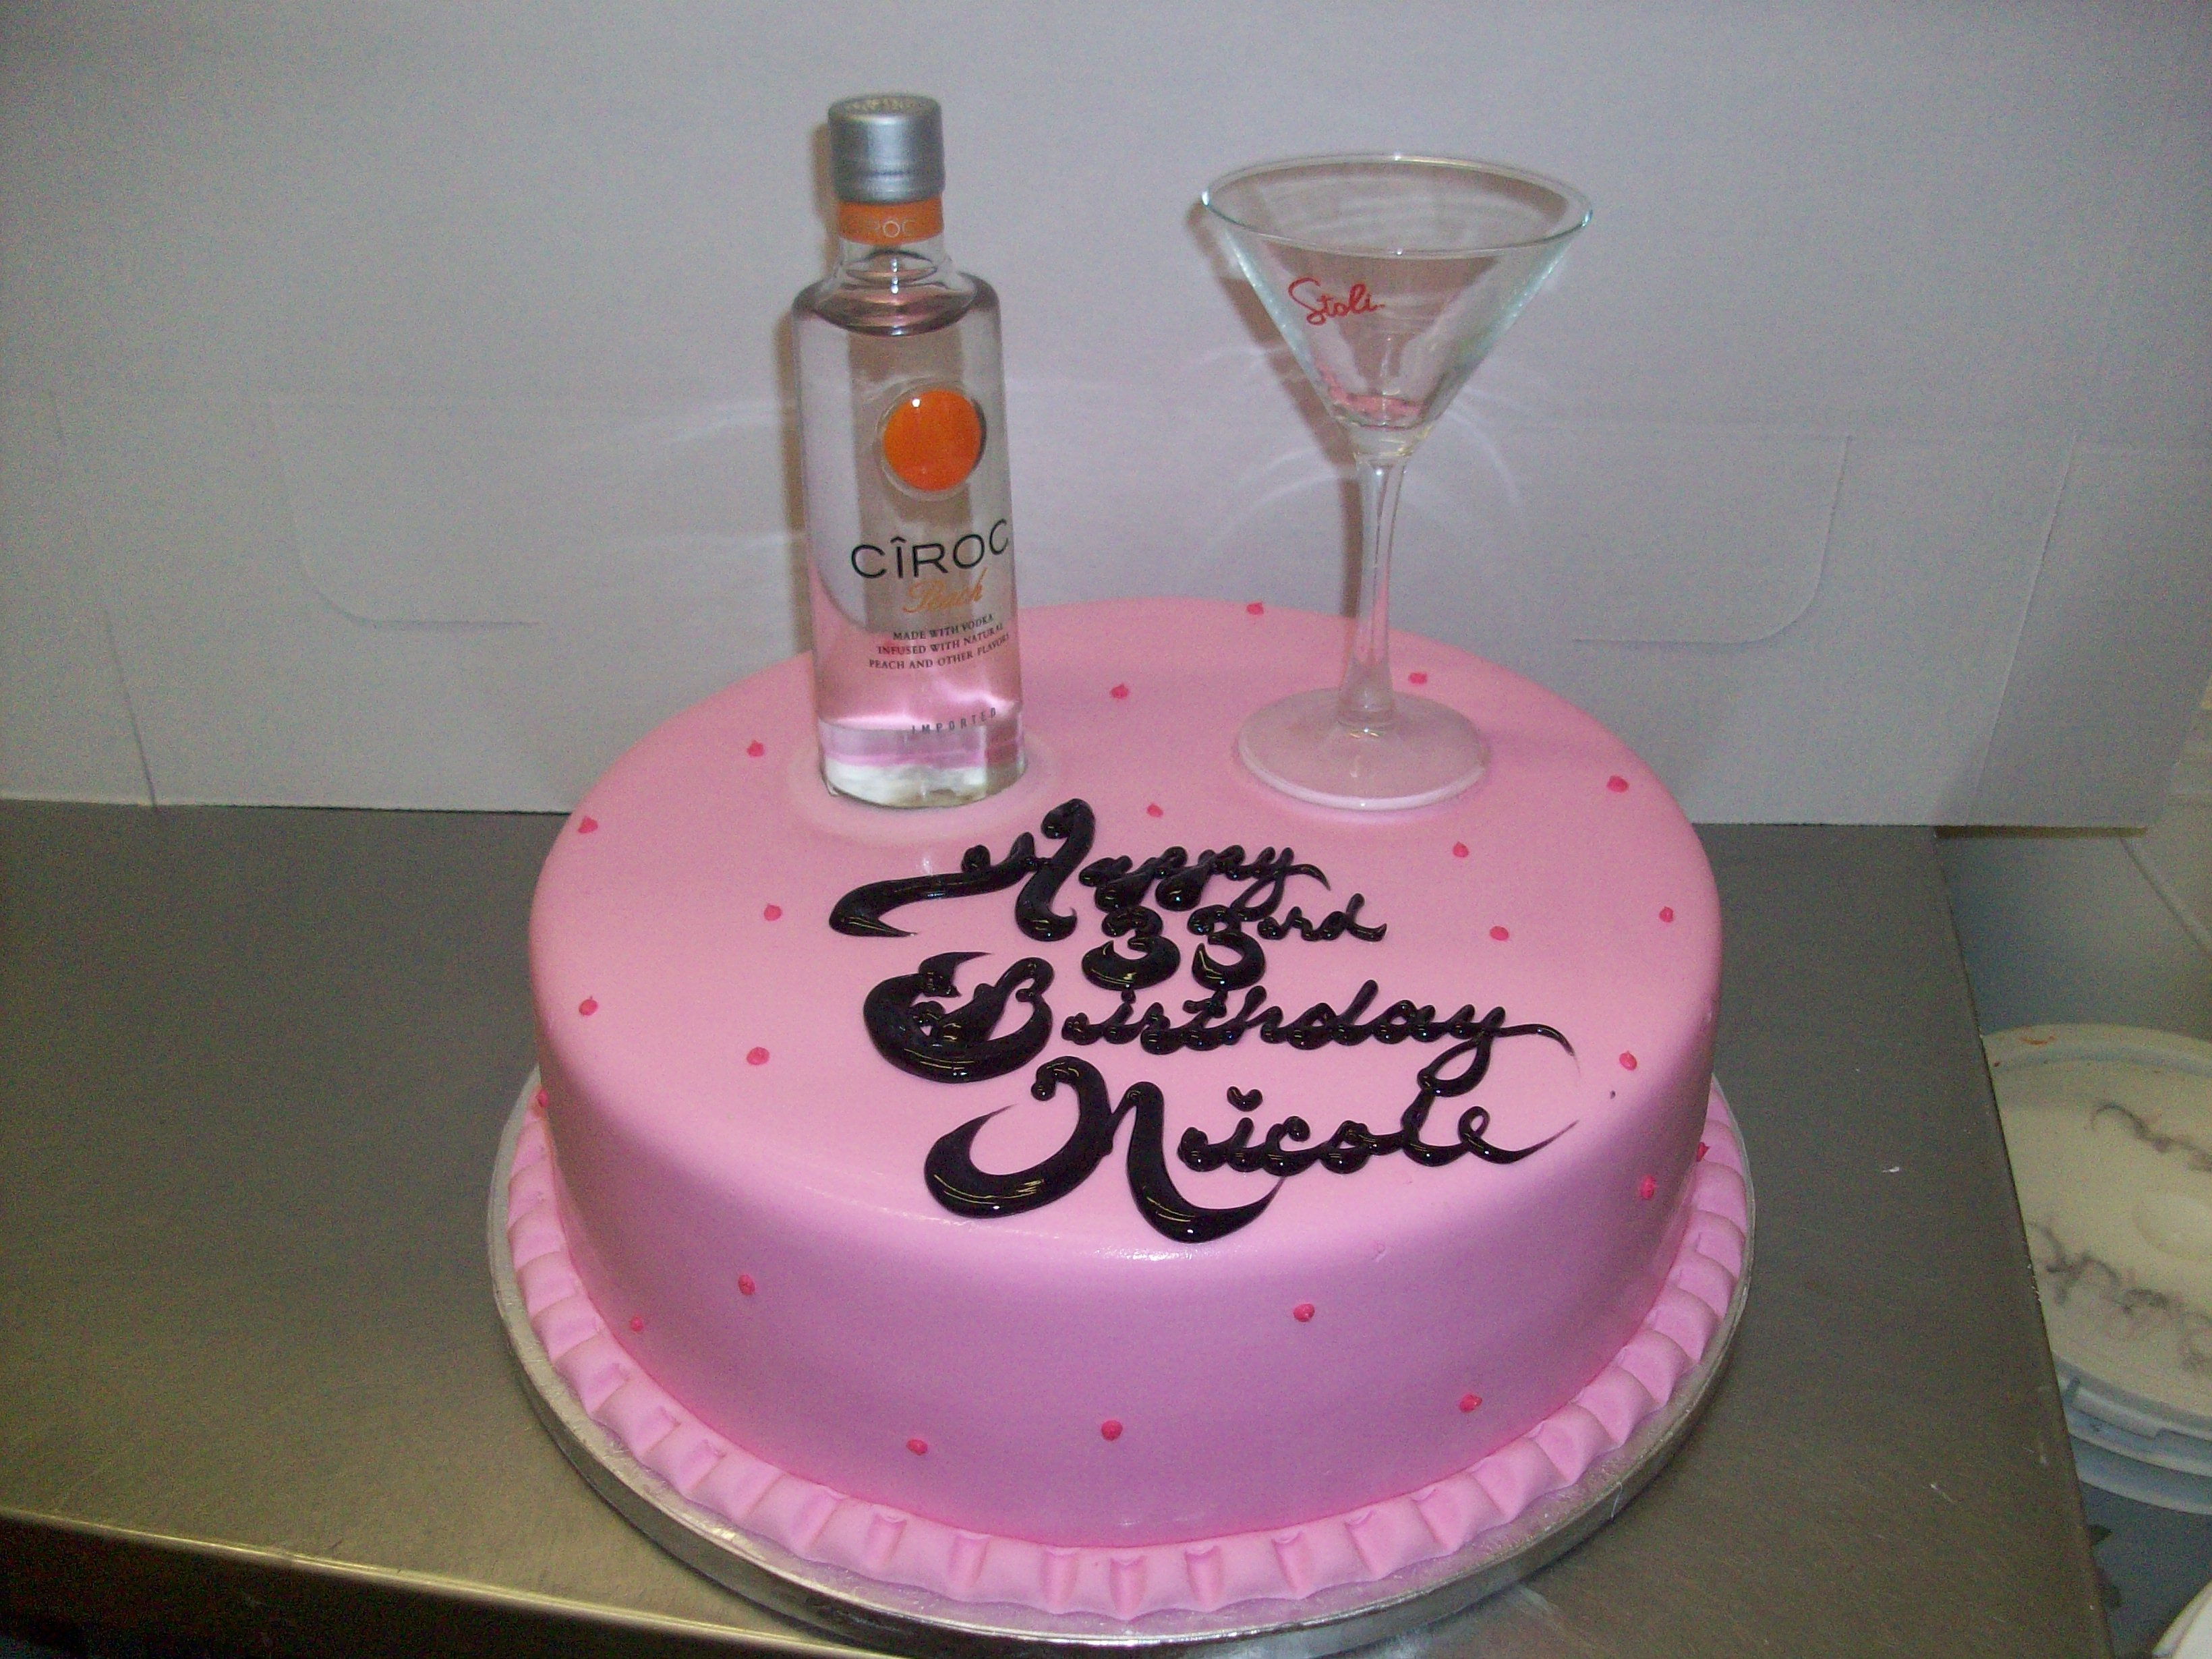 Ciroc Bottle Birthday Cakes Best Birthday Cake 2018